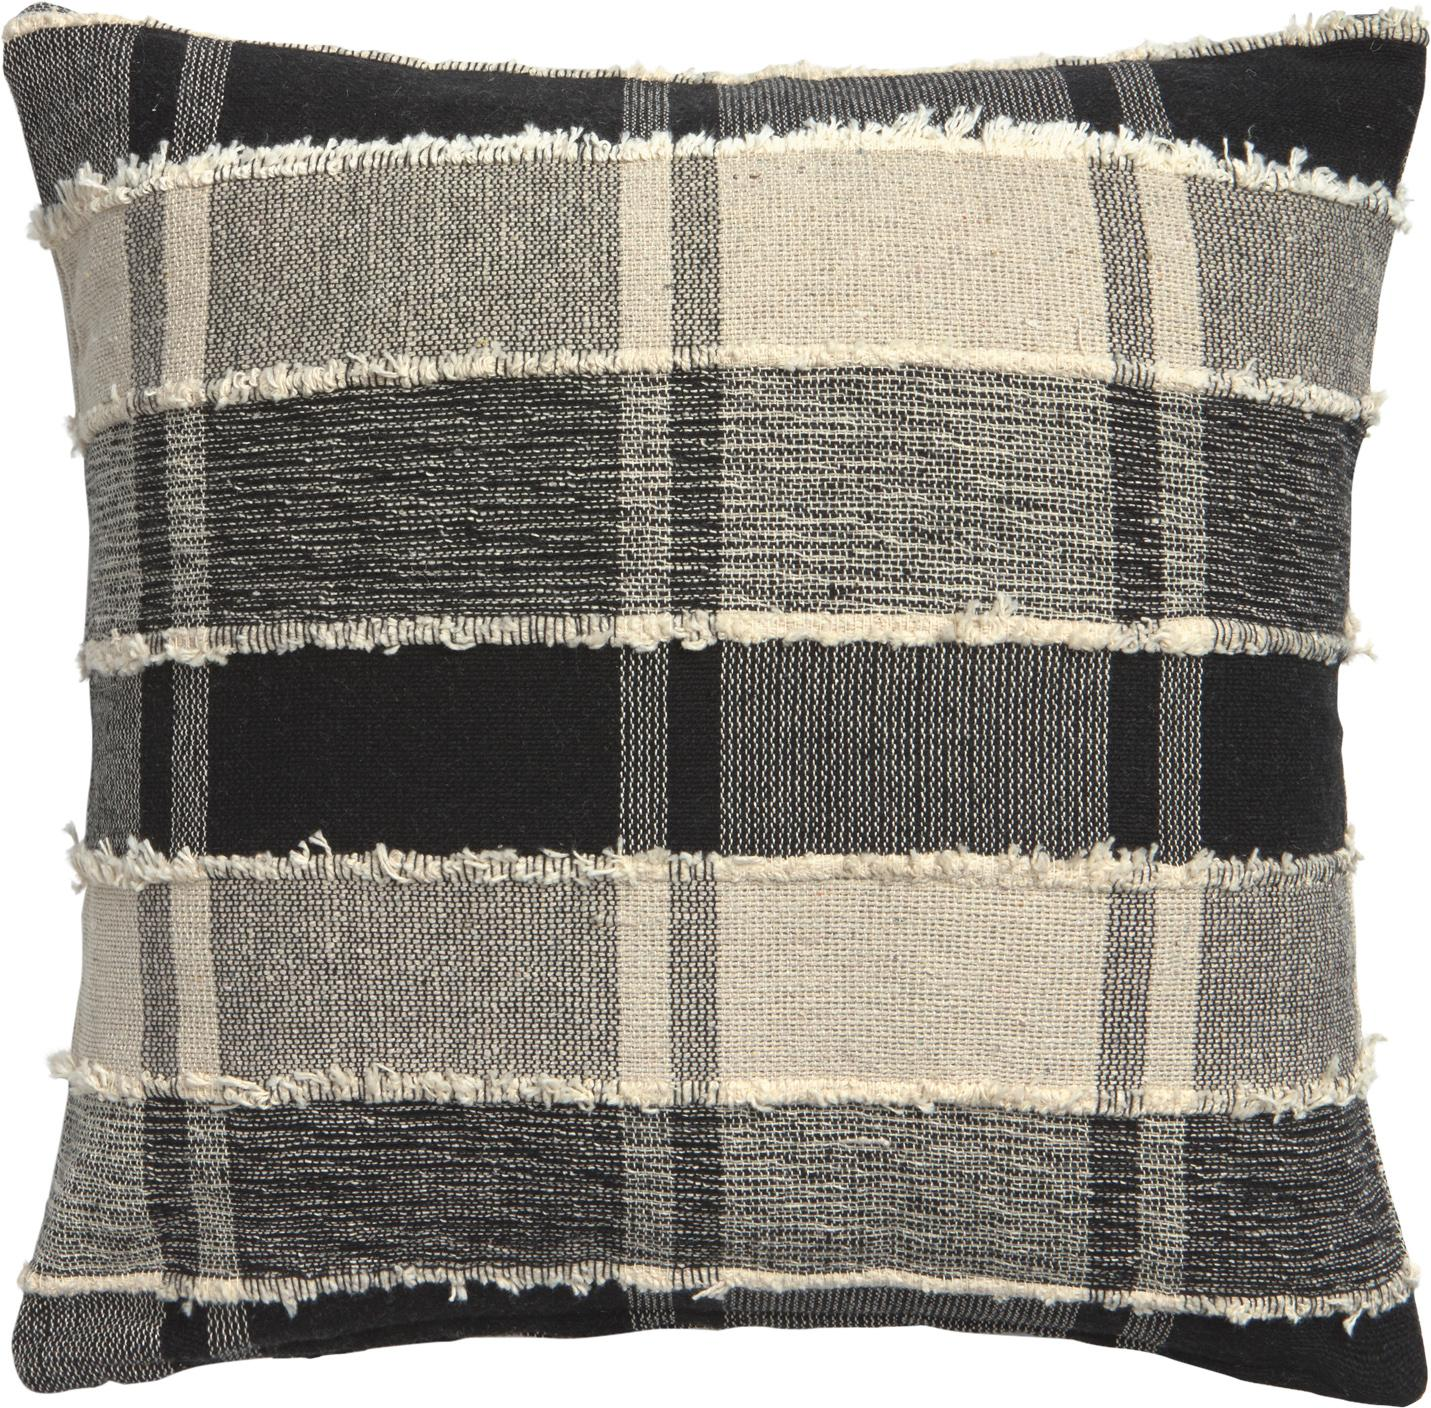 Funda de cojín con flecos Roberto, 100%algodón, Beige, negro, An 45 x L 45 cm